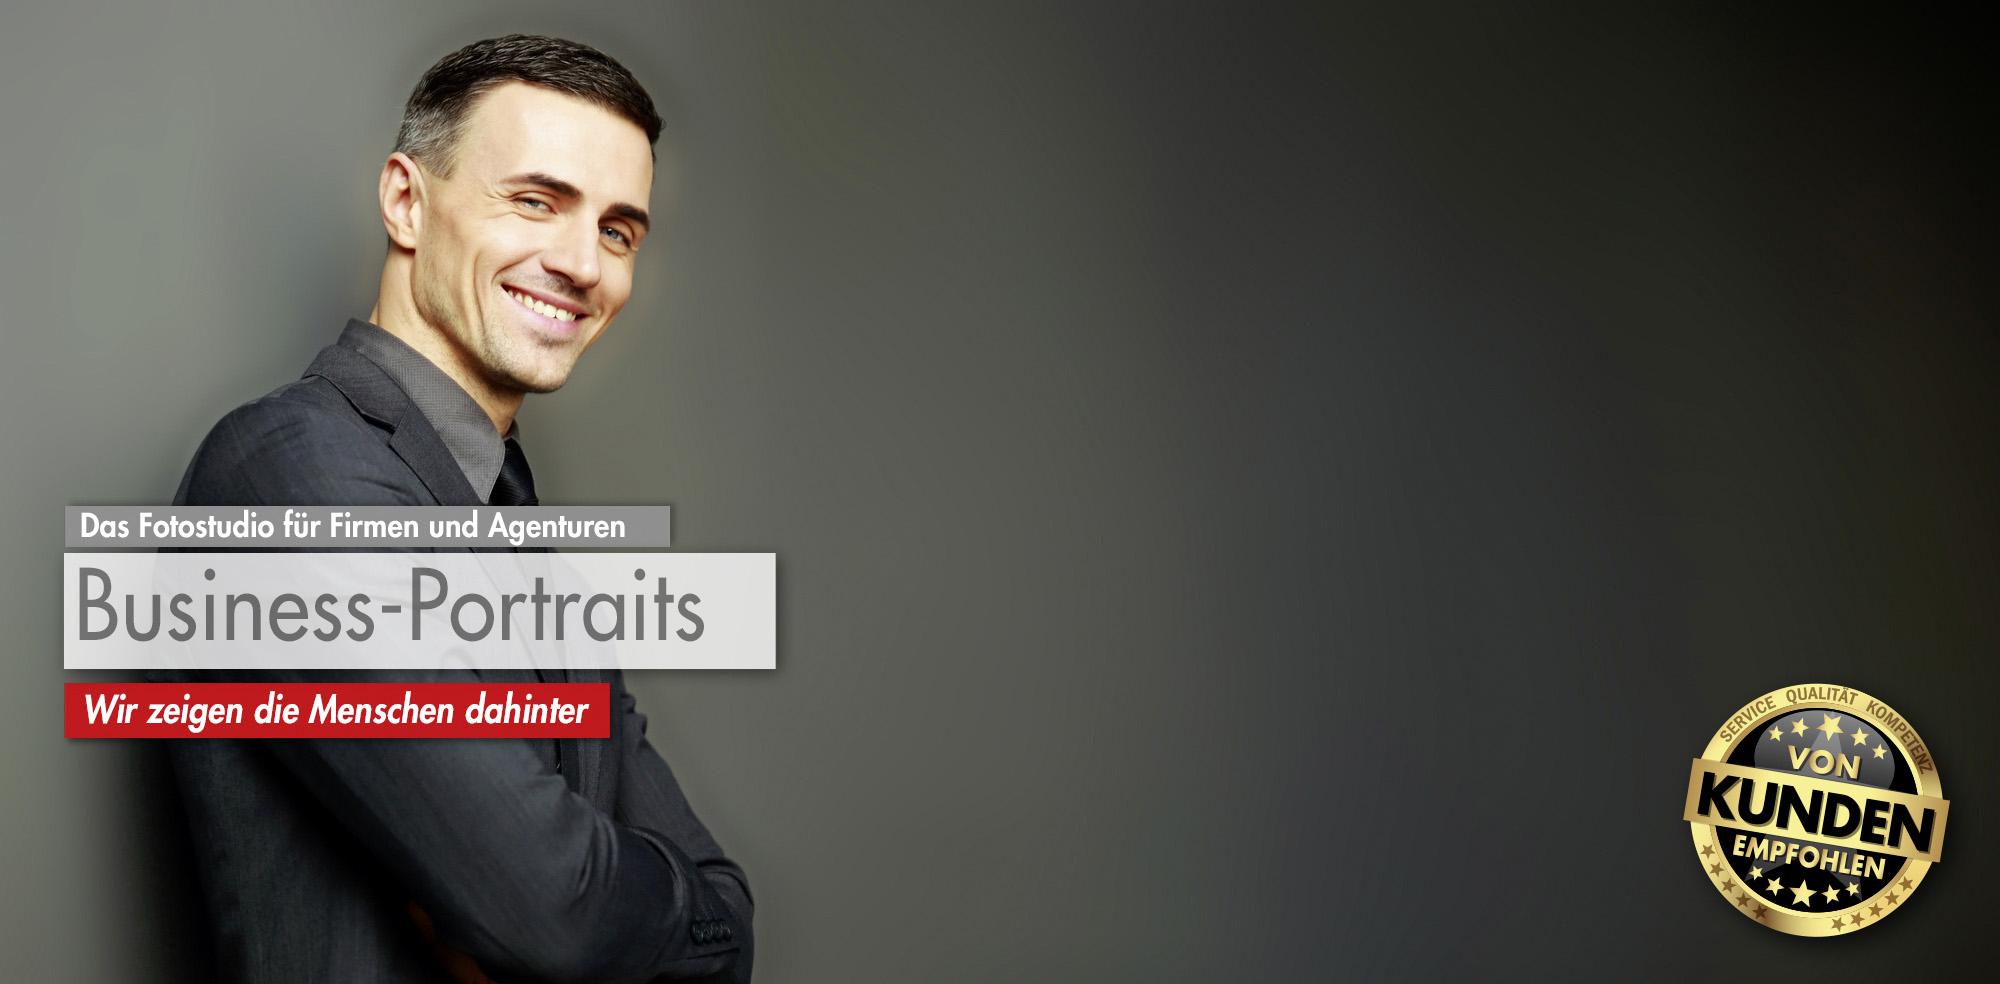 Business-Portrait, Businessfotografie, Firmenreportagen und professionelle Fotoreportagen@blickfang2_fotostudio_filmstudio